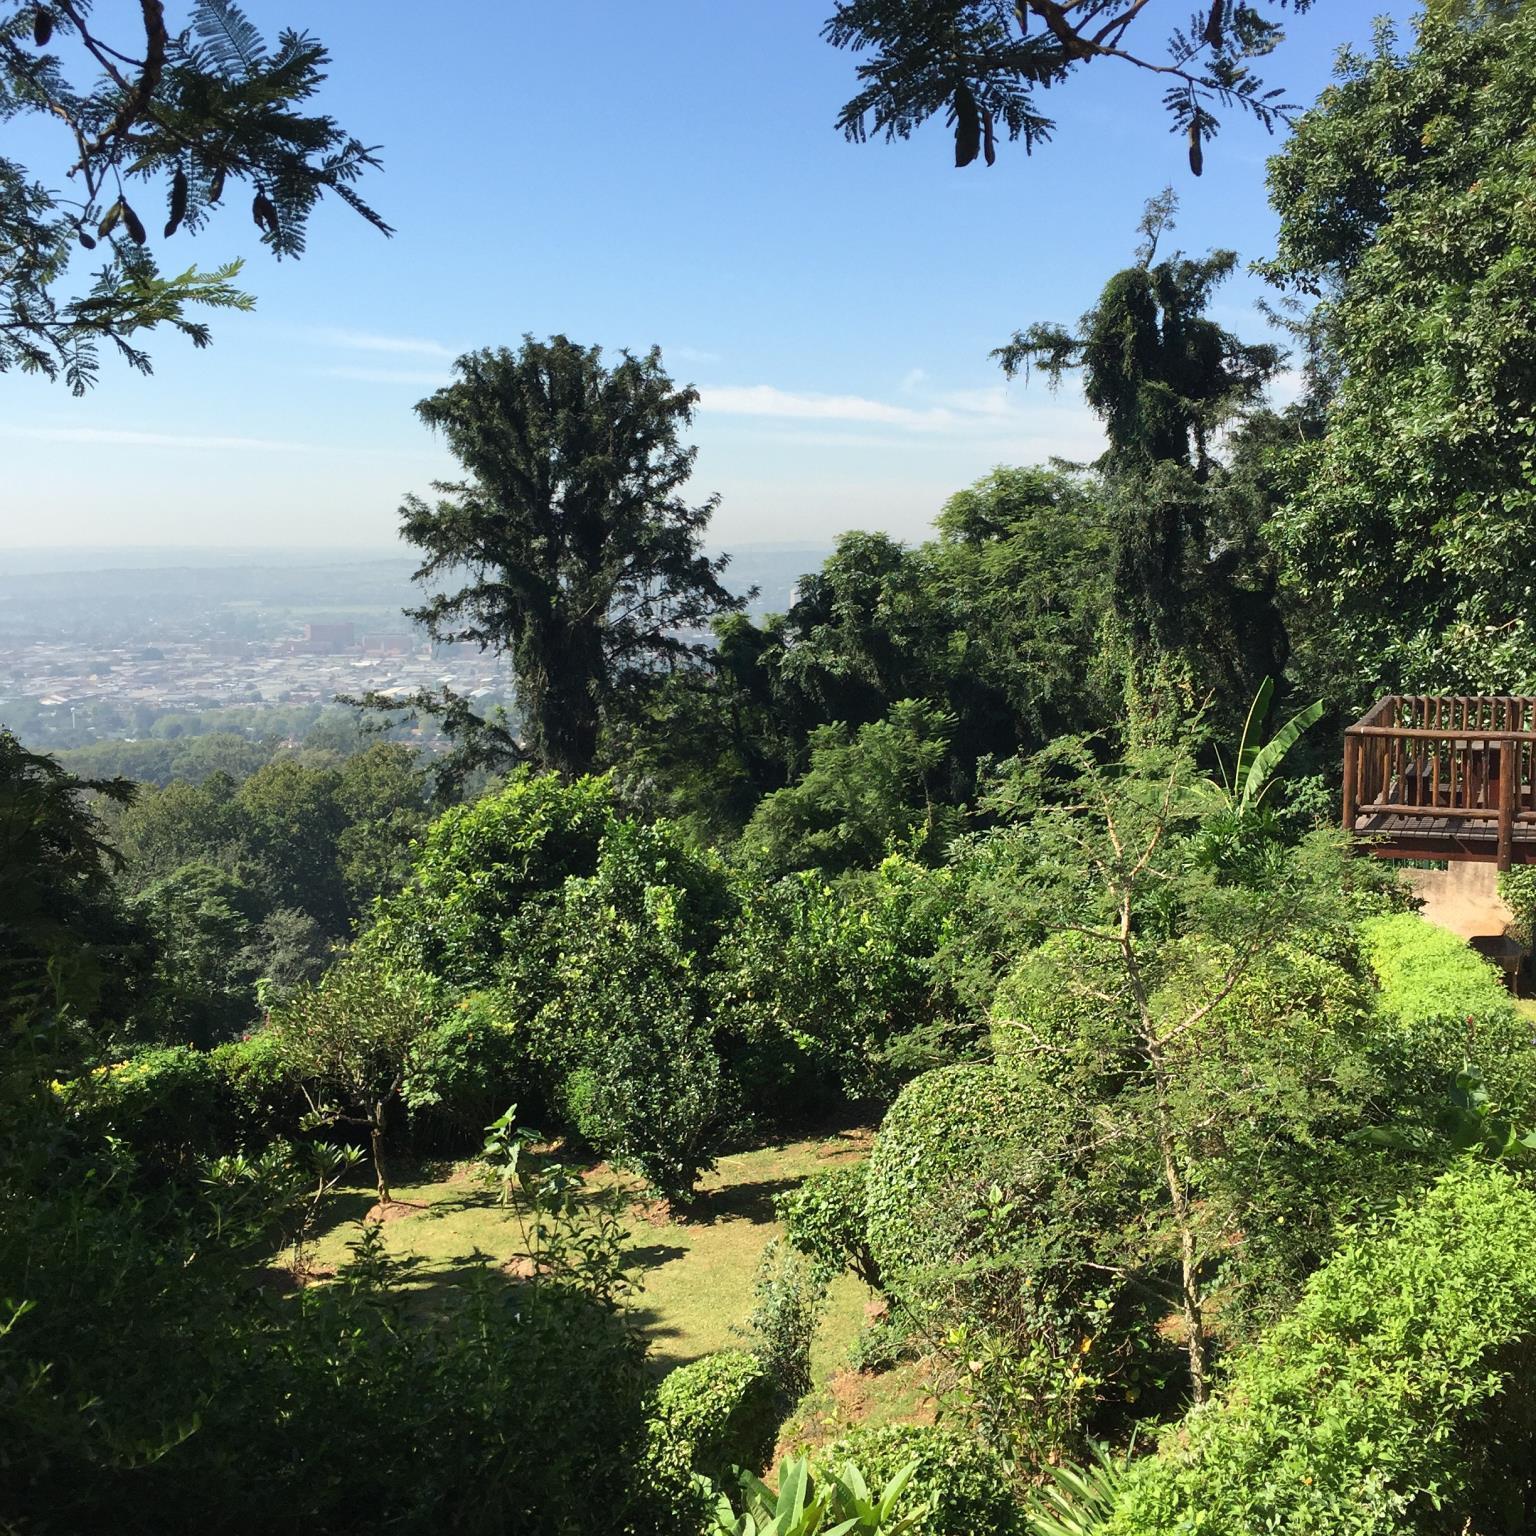 Valley Vista Lodge B&B, Umgungundlovu